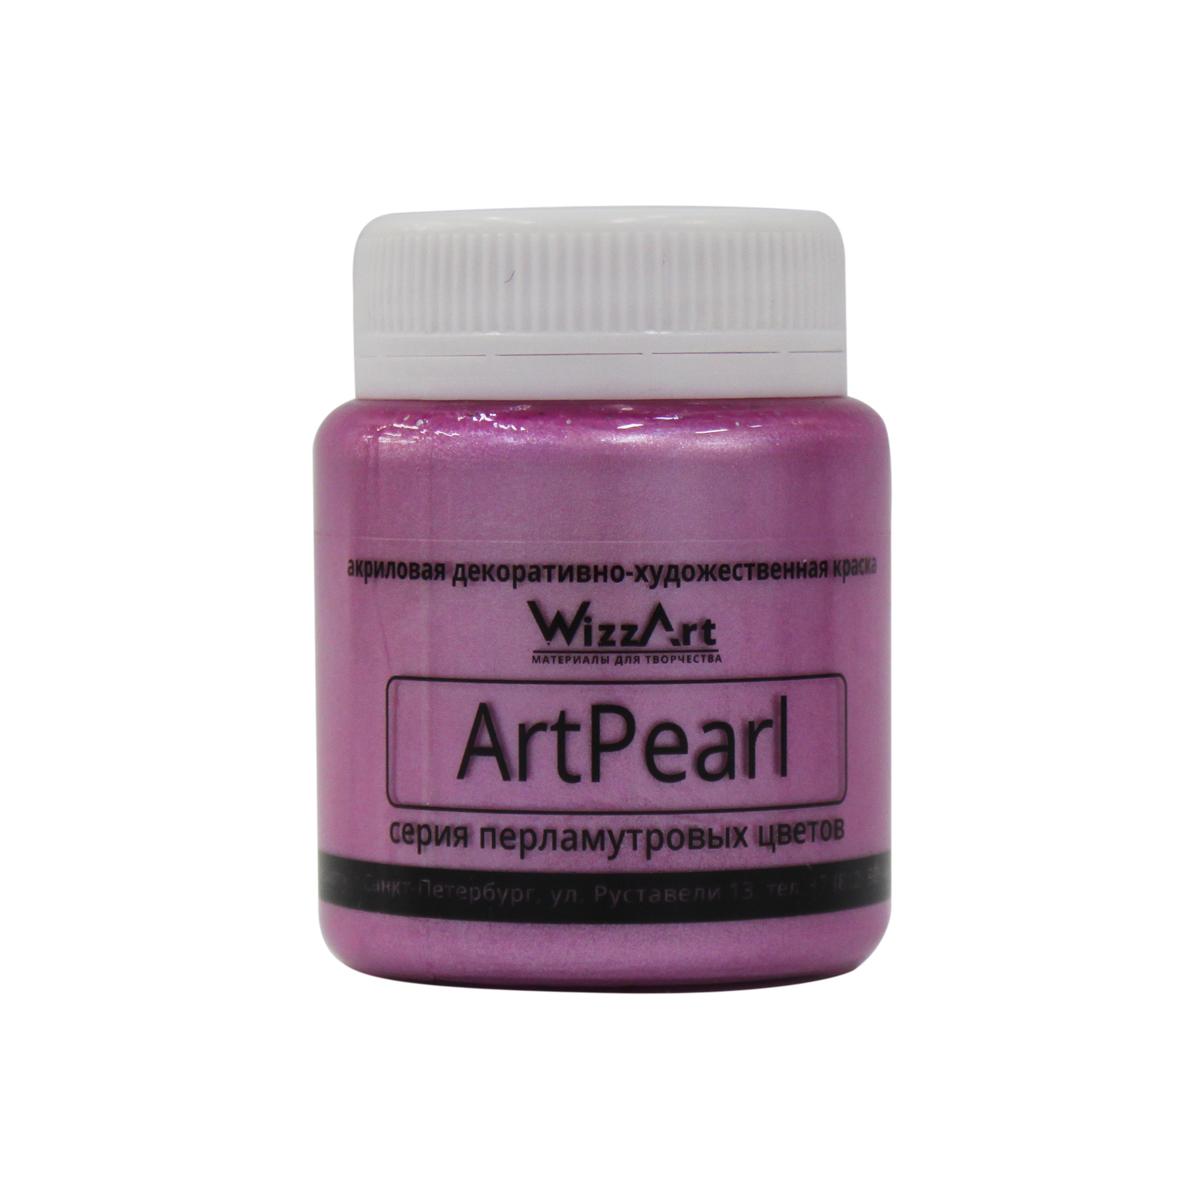 Краска акриловая Wizzart ArtPearl, цвет: розовый, 80 мл501021